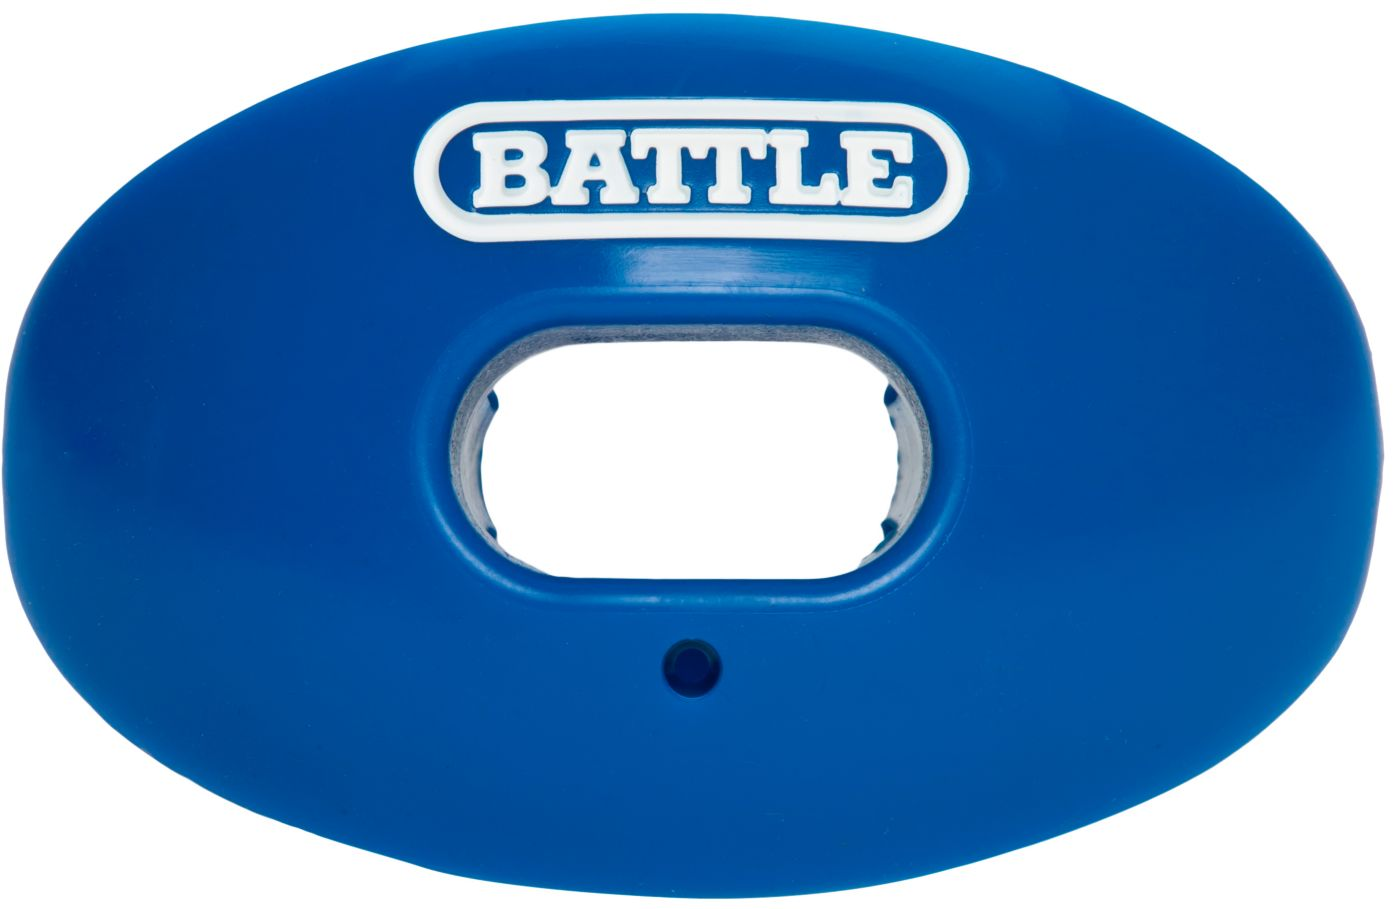 Battle Oxygen Lip Protector